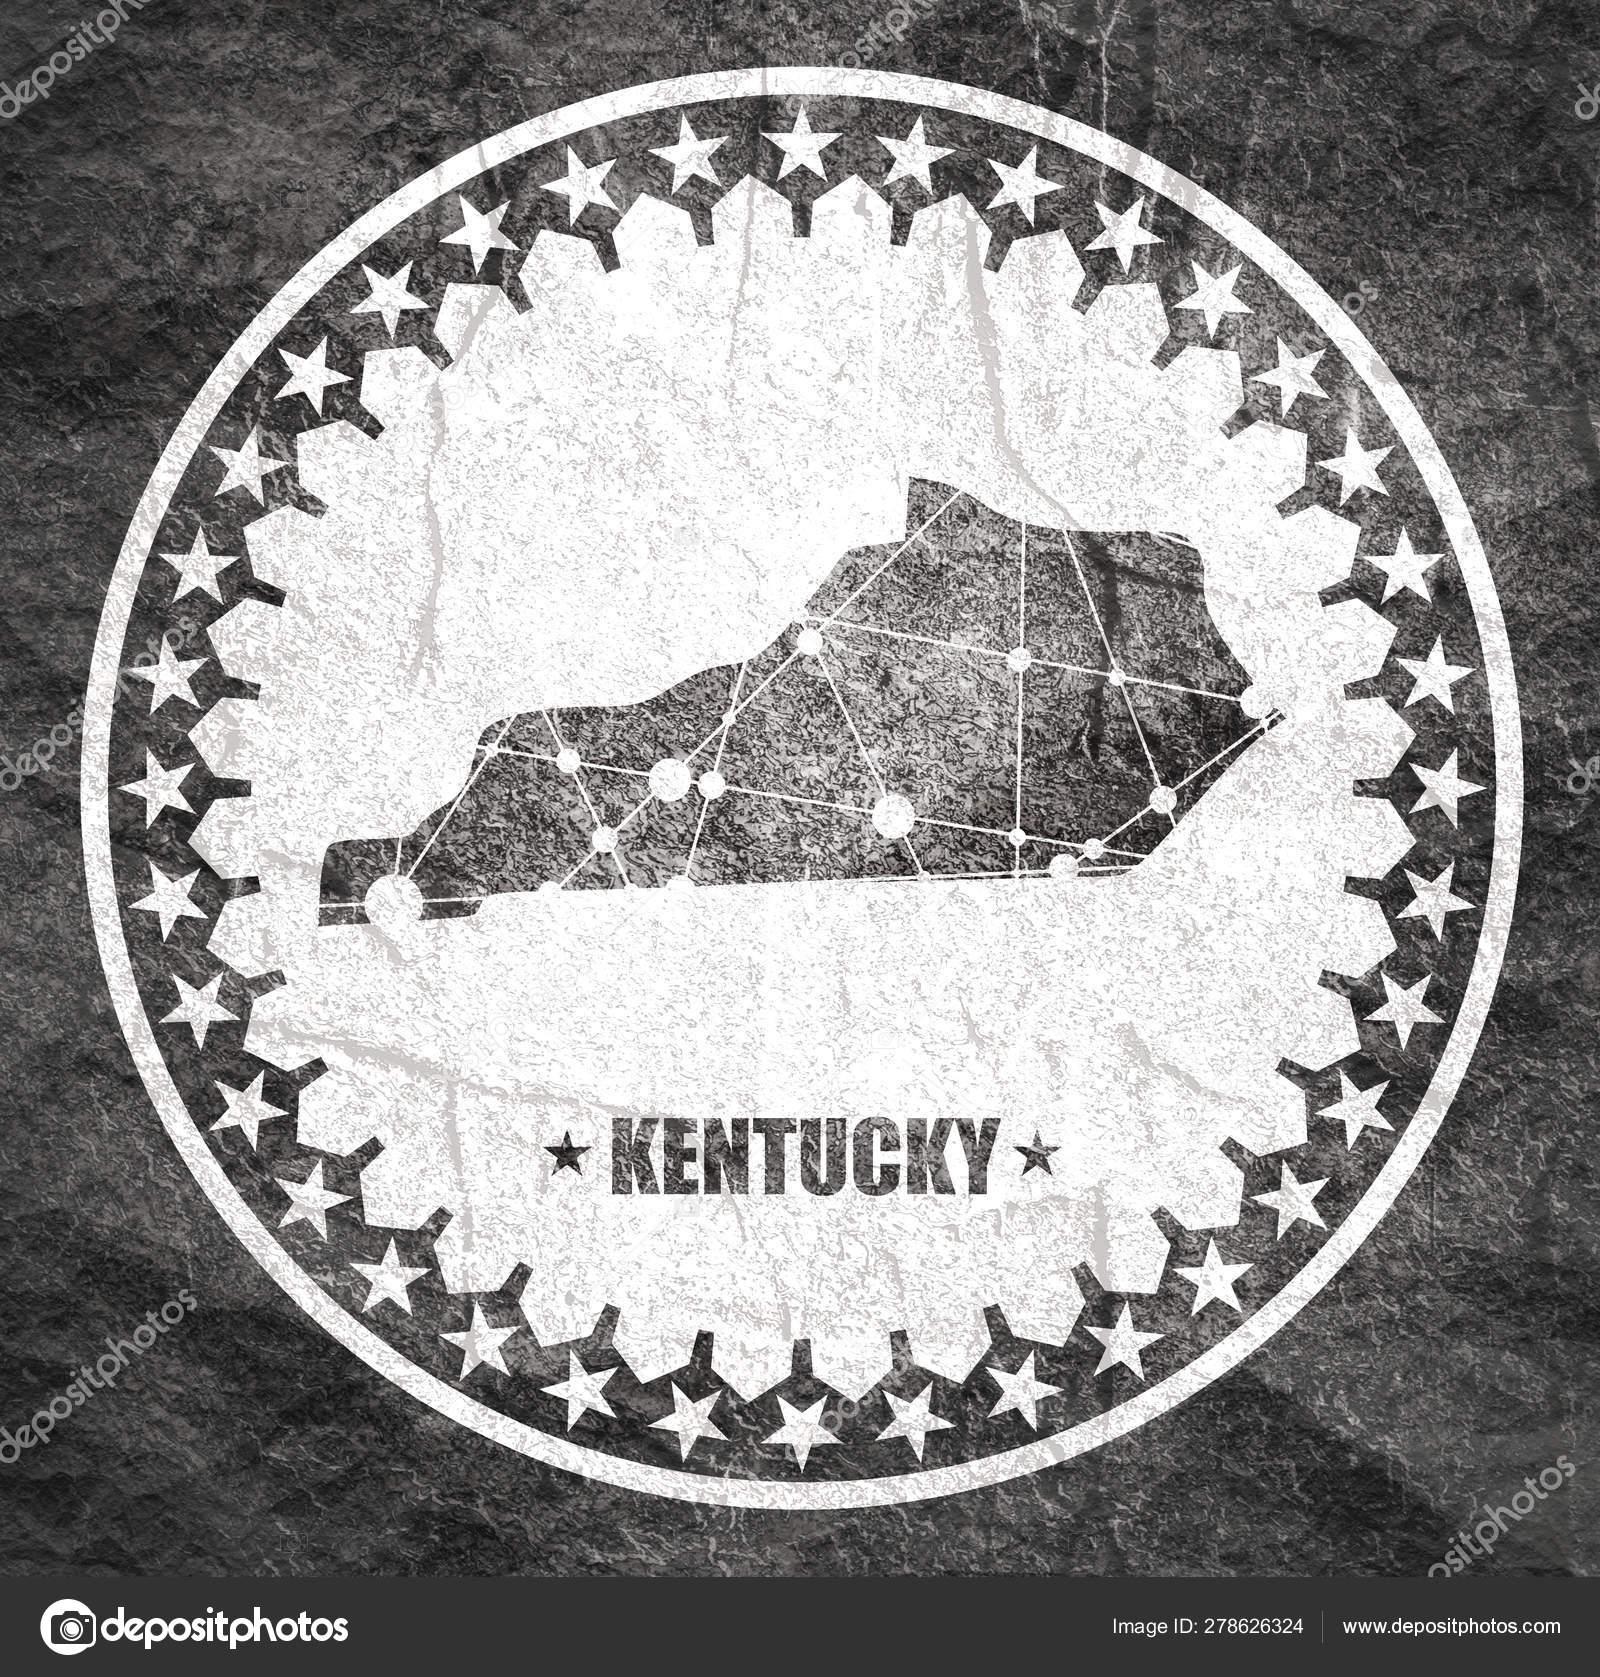 Kentucky state map — Stock Photo © JEGAS_RA #278626324 on massachusetts state map, tennessee map, maine state map, tenn state map, u.s map, maryland state map, louisiana on us map, south dakota state map, indiana map, kentucky capitol building, arizona state map, new york state map, arkansas state map, texas state map, louisiana state map, pennsylvania state map, minnesota map, virginia state map, colorado state map, louisville map,